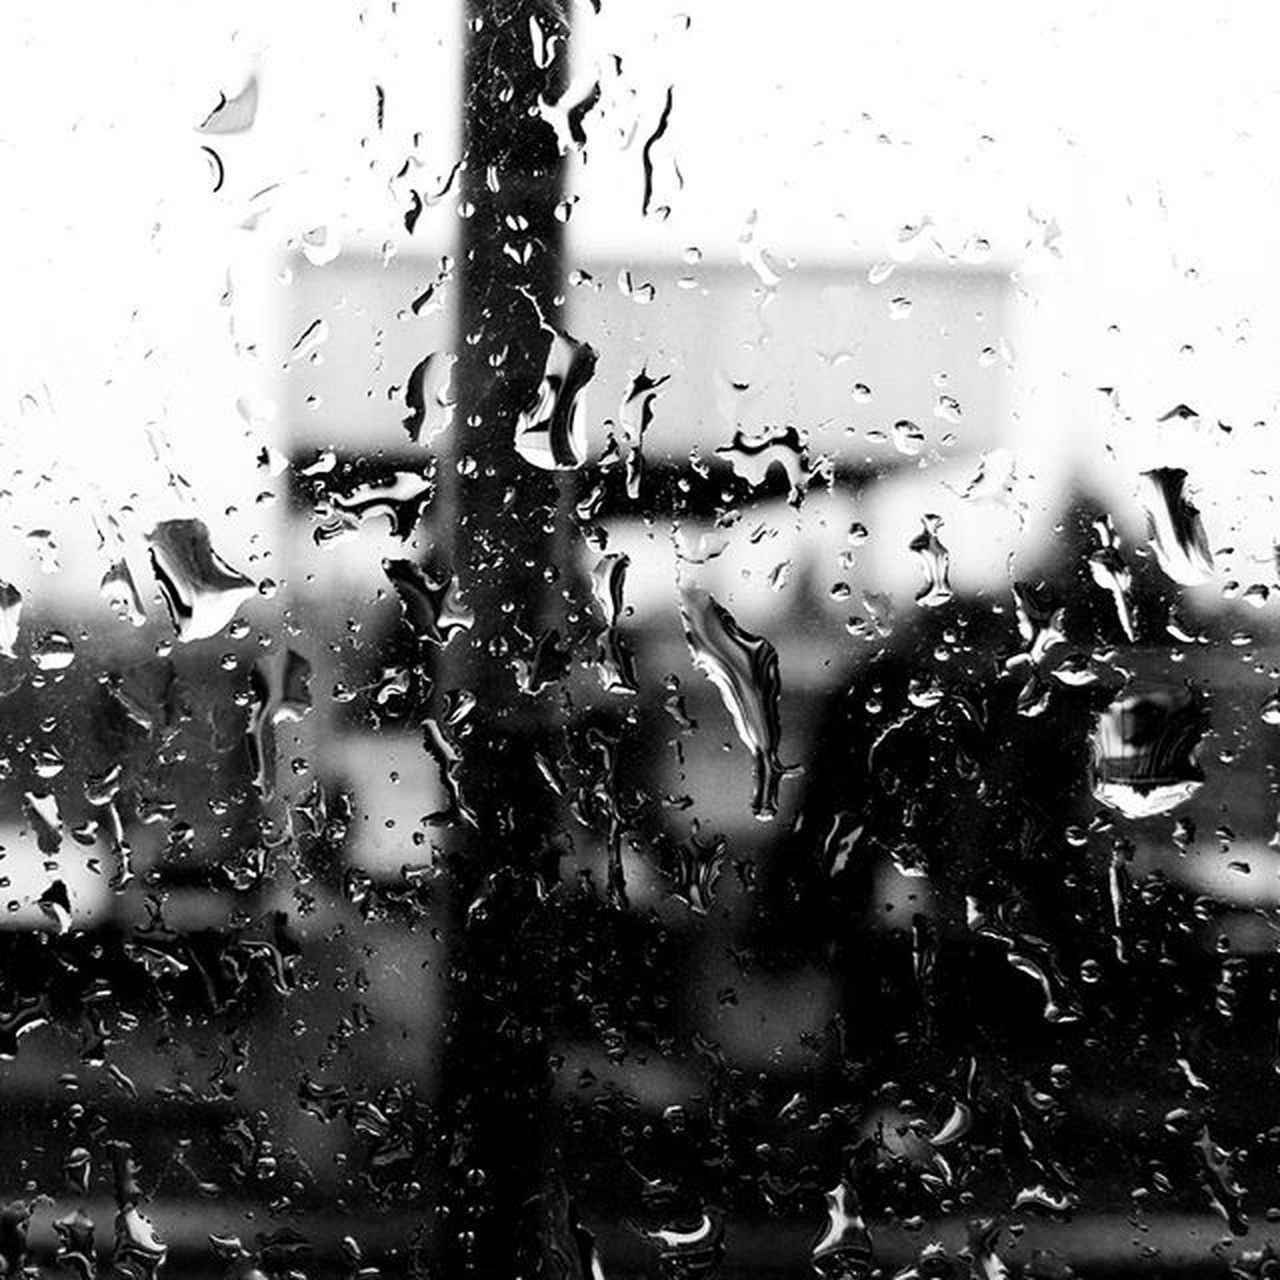 glass - material, transparent, window, drop, wet, rain, water, full frame, raindrop, land vehicle, rainy season, indoors, close-up, transportation, no people, mode of transport, backgrounds, car, condensation, car interior, day, sky, nature